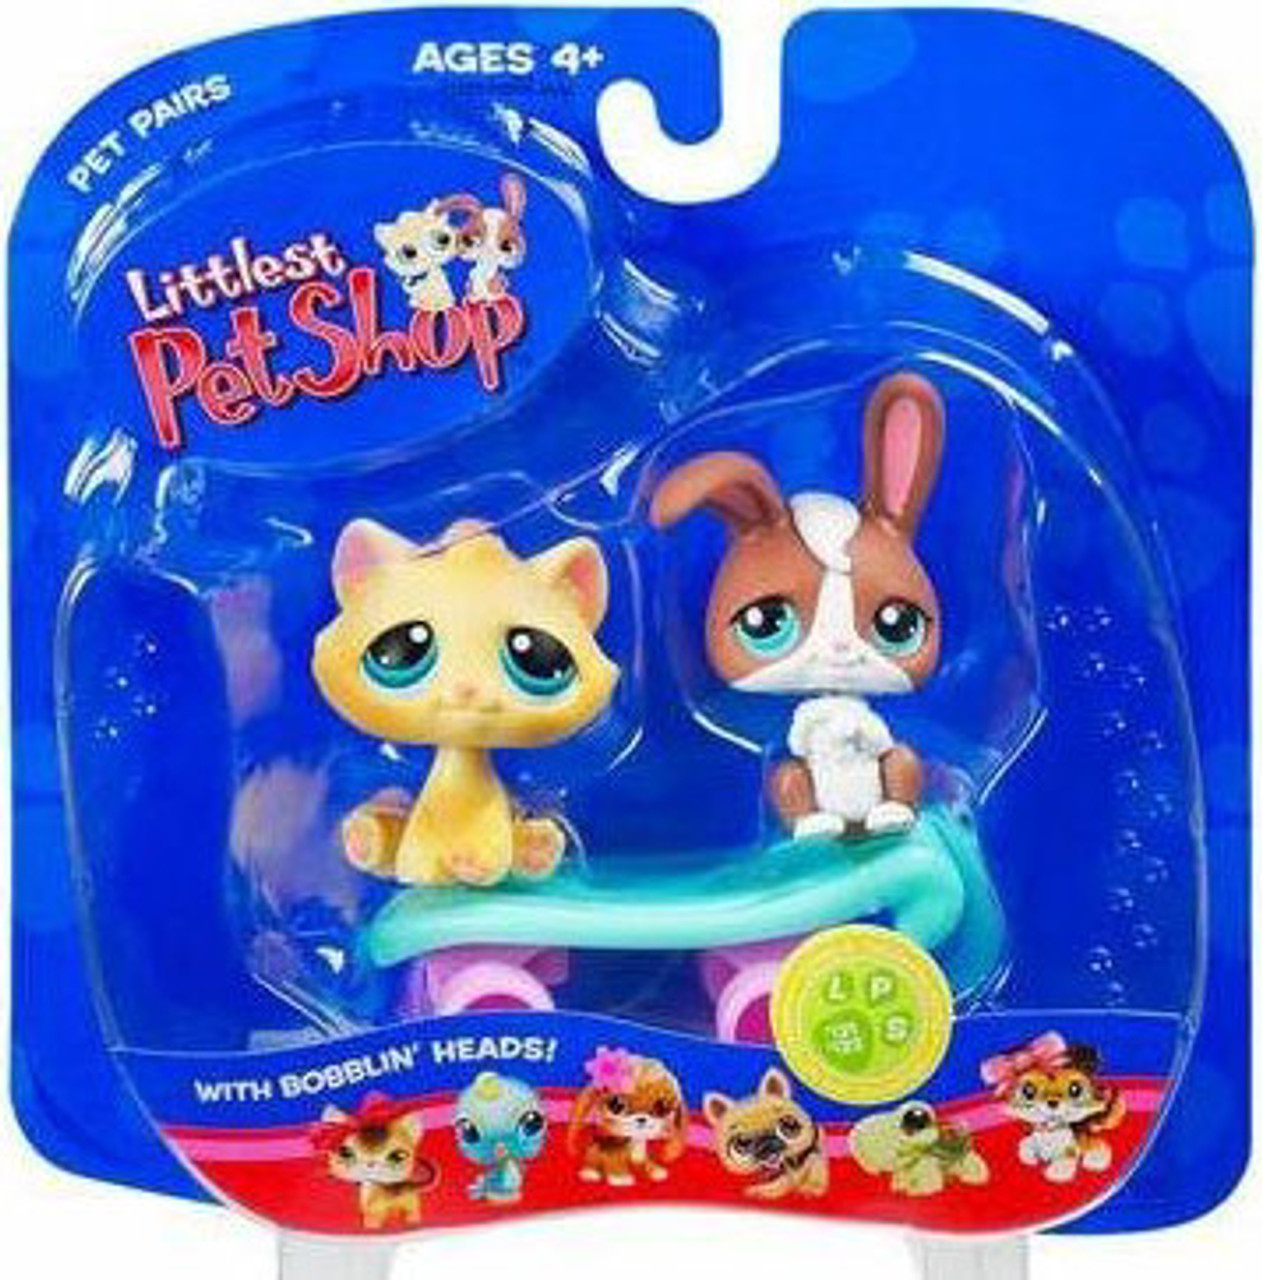 Littlest Pet Shop Pet Pairs Bunny & Cat Figure 2-Pack [Skateboard]